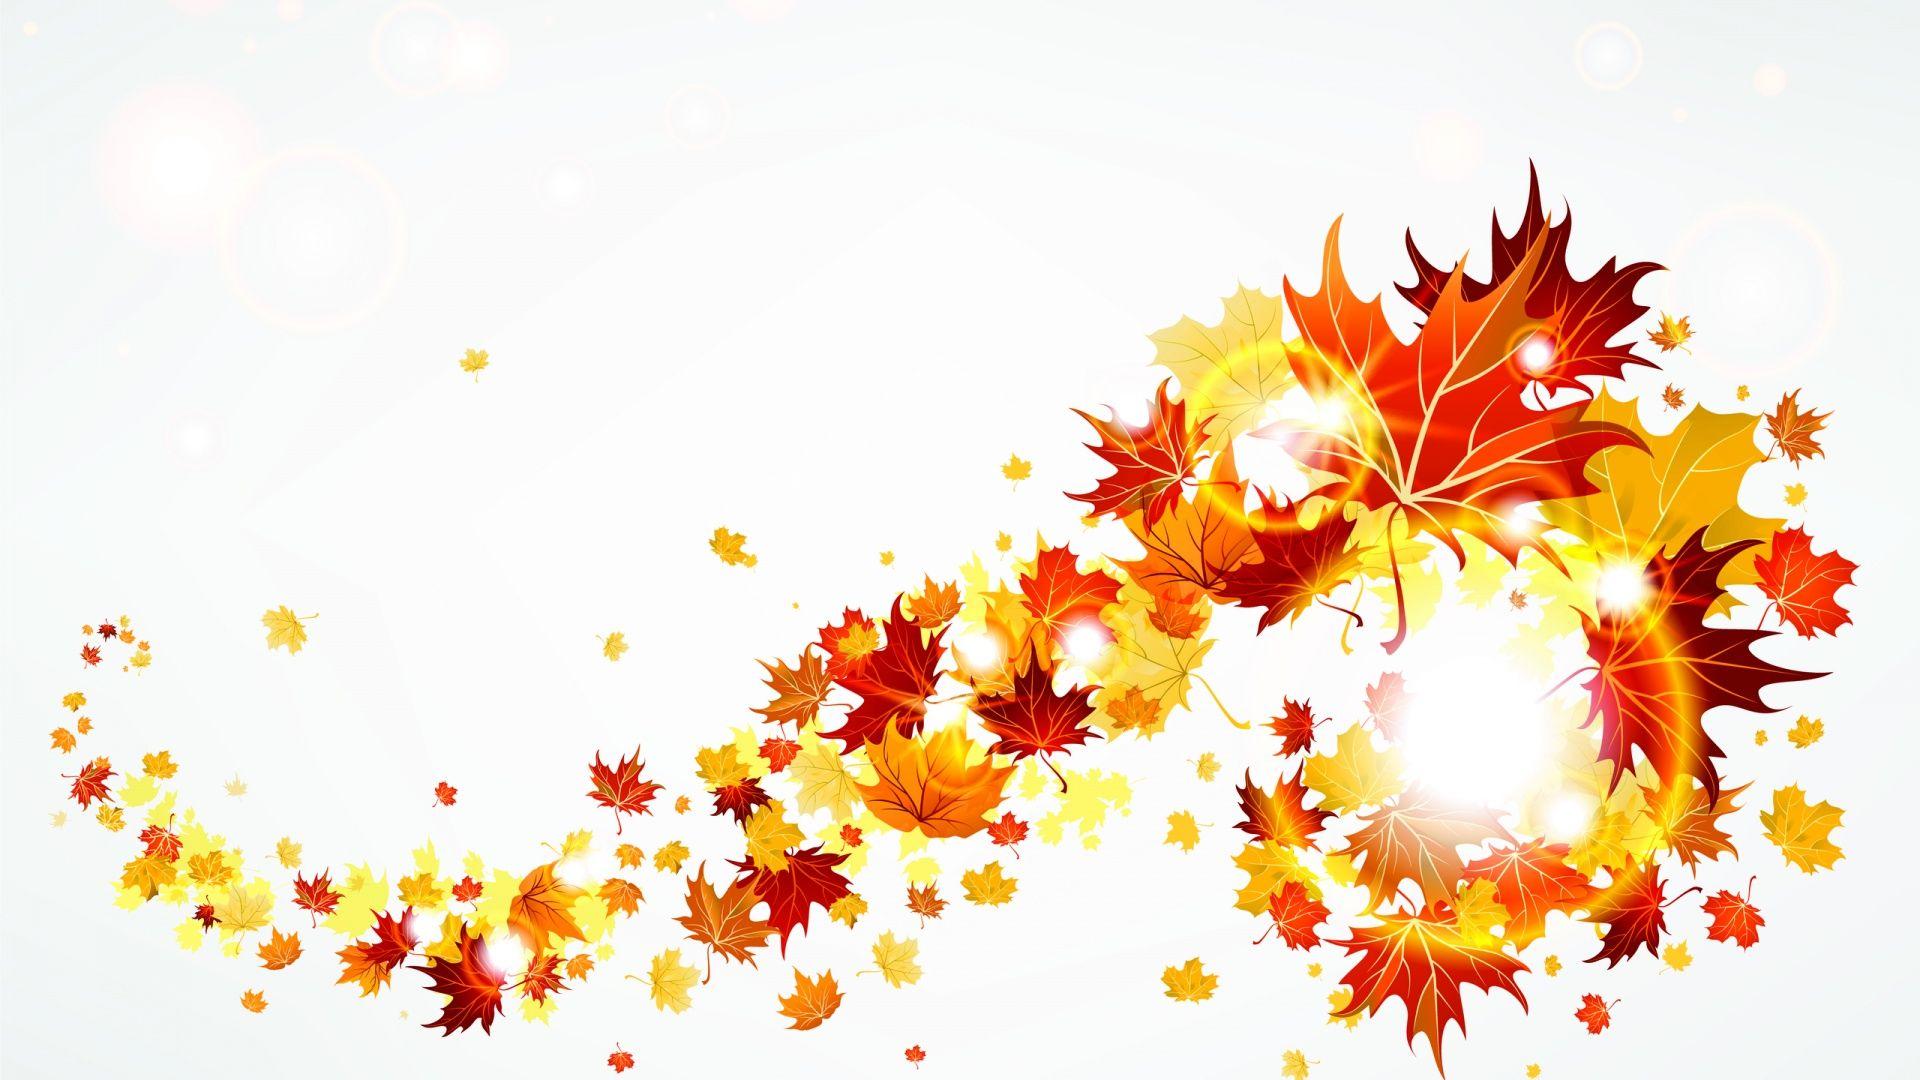 Fall border autumn free clip art danasokb top image #33786.